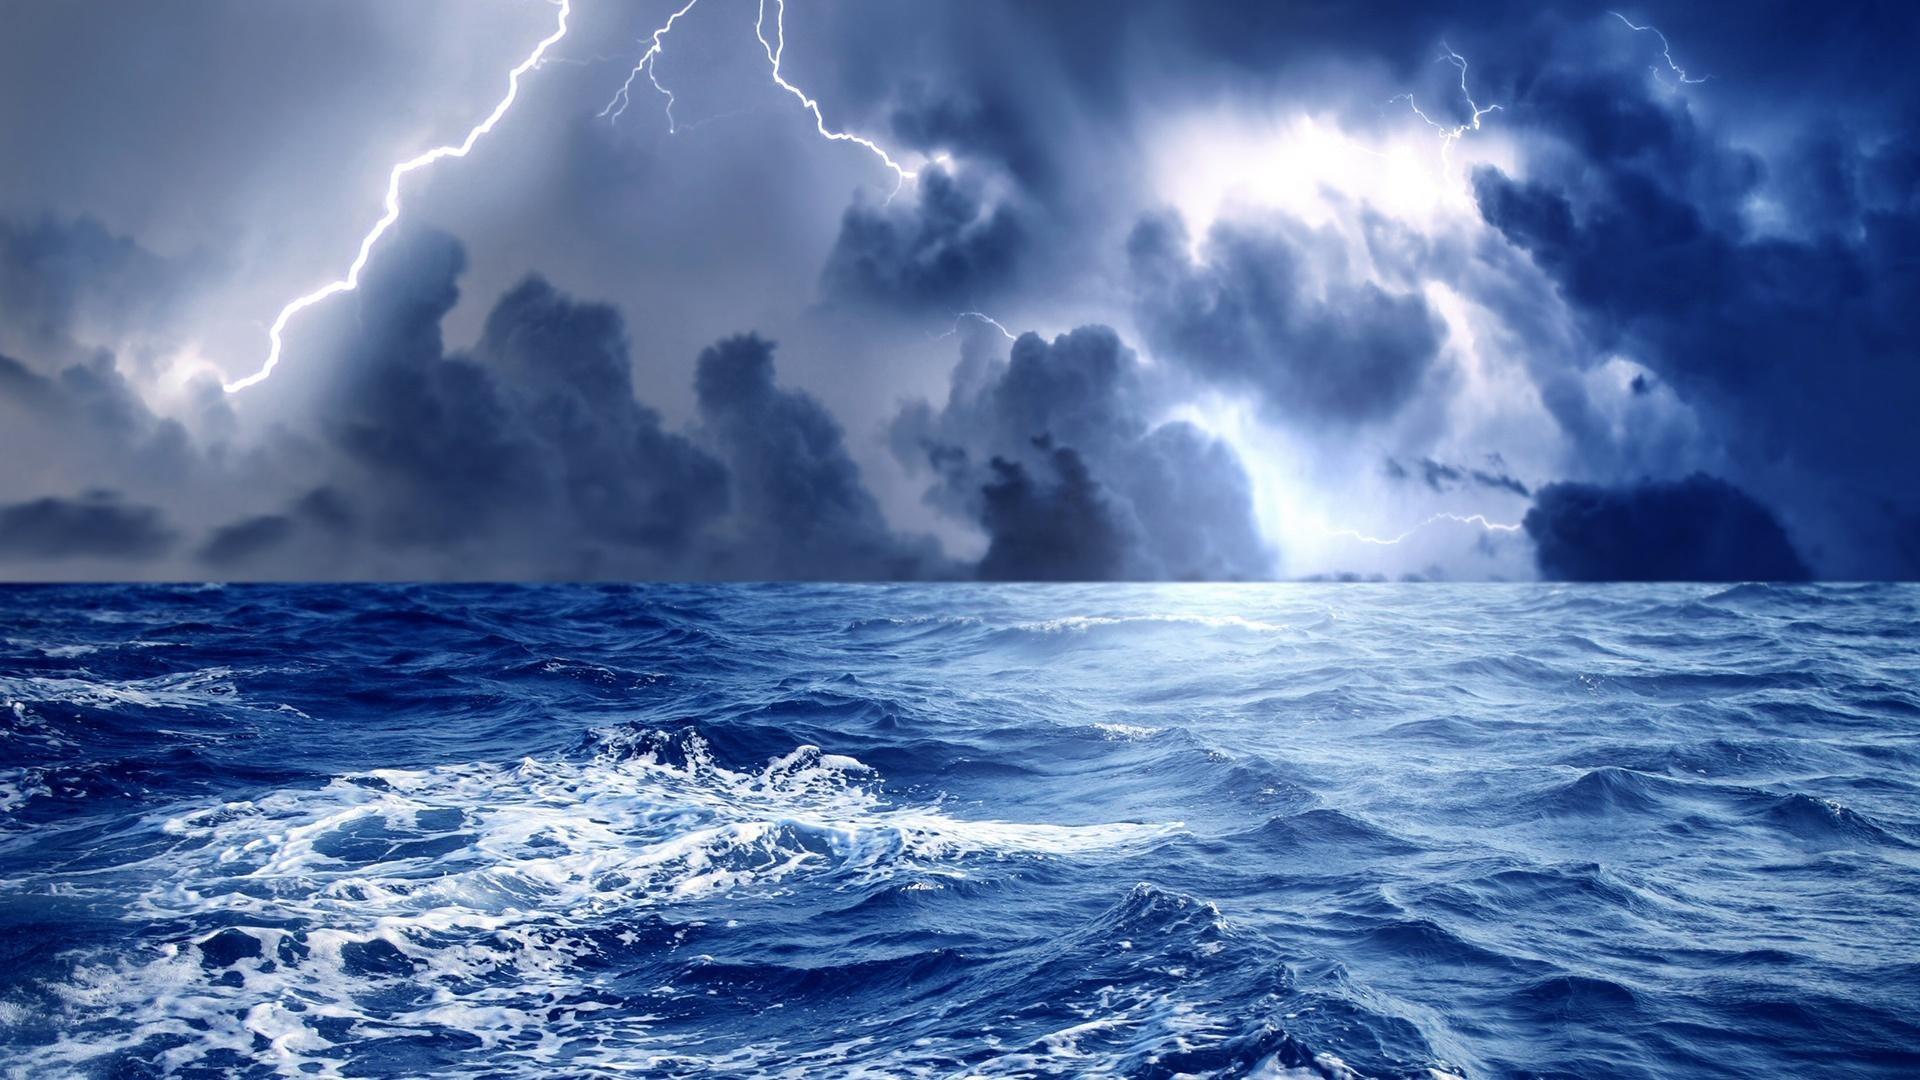 Res: 1920x1080, Beautiful Thunder Lightning Sea Storm Wallpapers